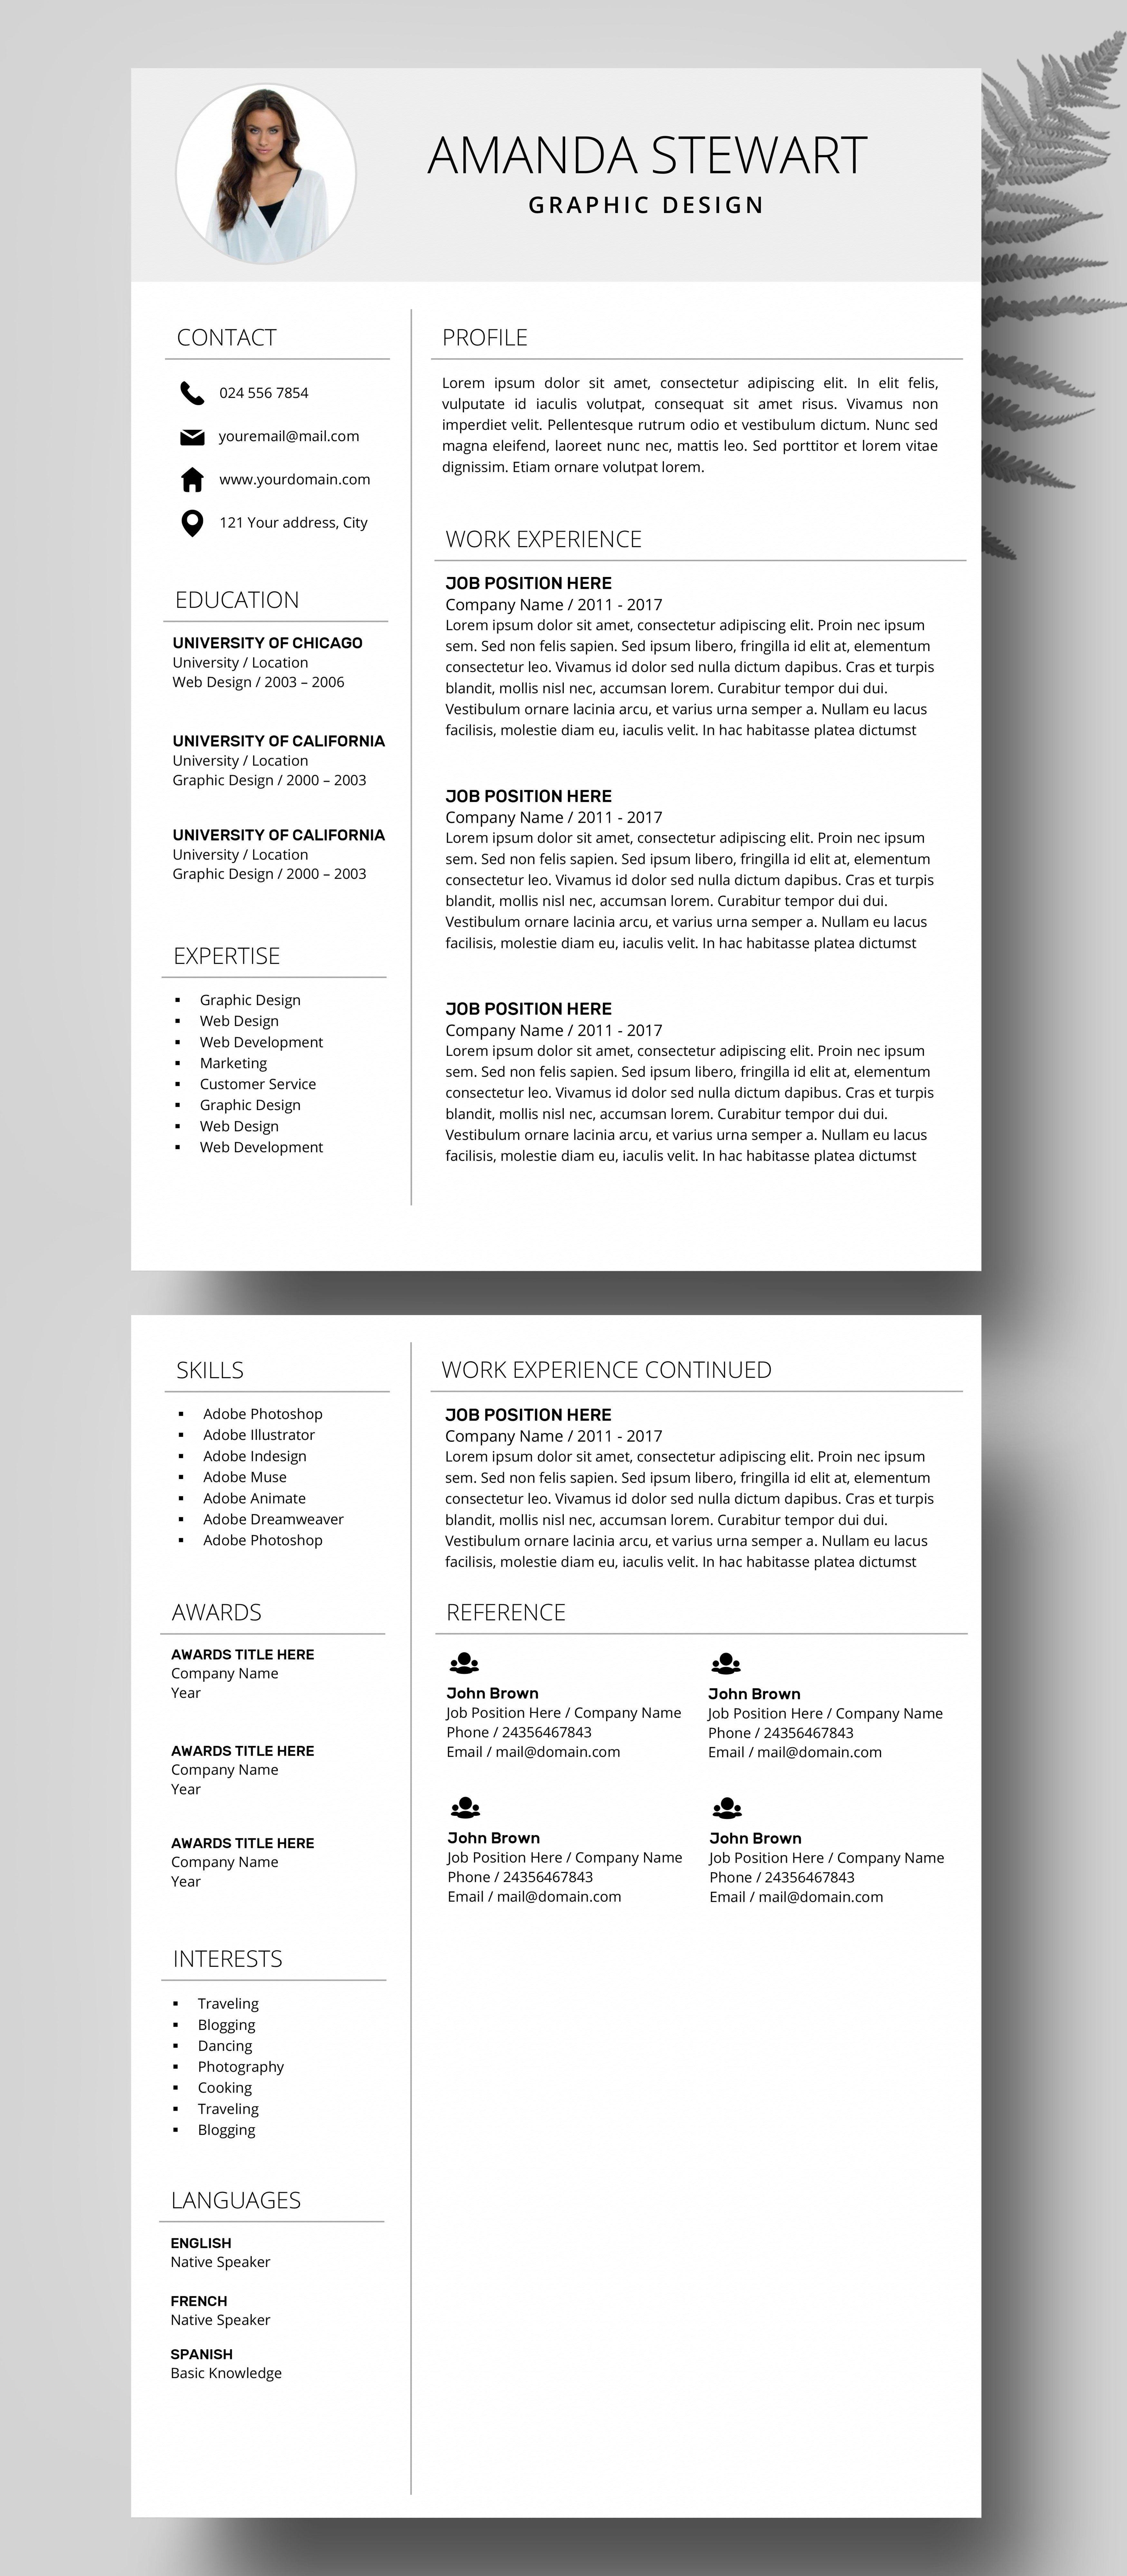 Resume Template Cv Template Professional Resume Resume Template Word Simple Resume Instant Download Photo Teacher Resume Cv Template Professional Resume Template Word Cv Template